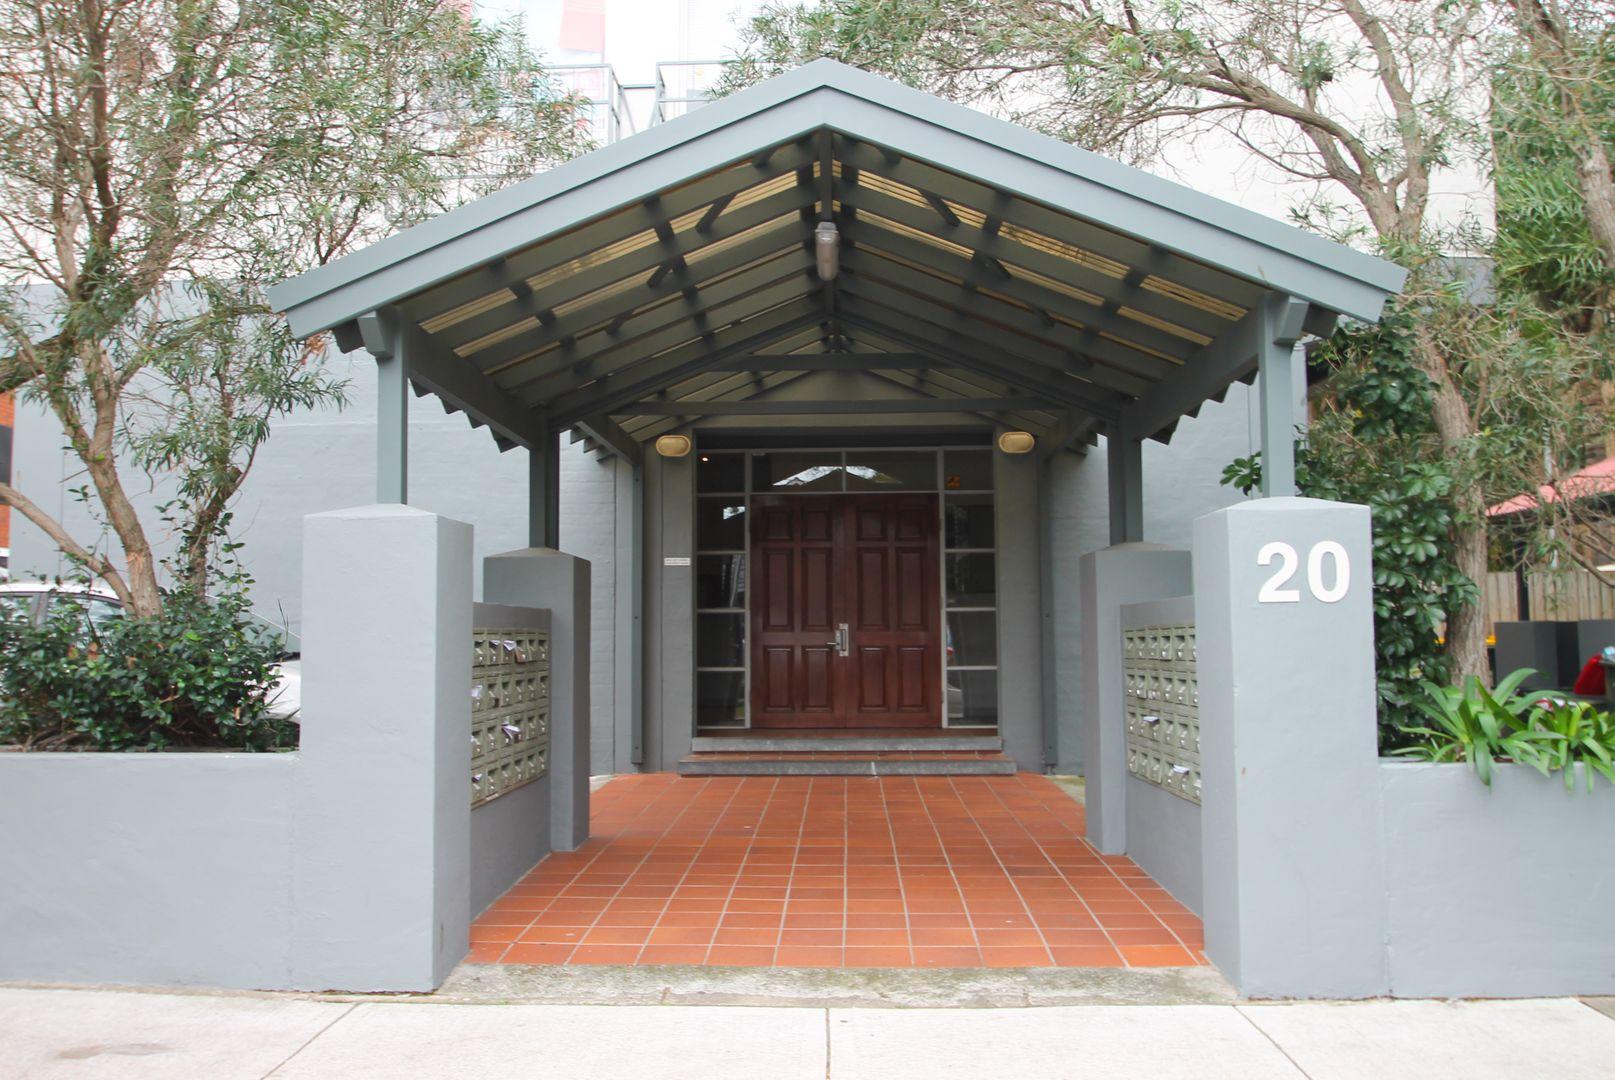 54/20 Maroubra Road, Maroubra NSW 2035, Image 0